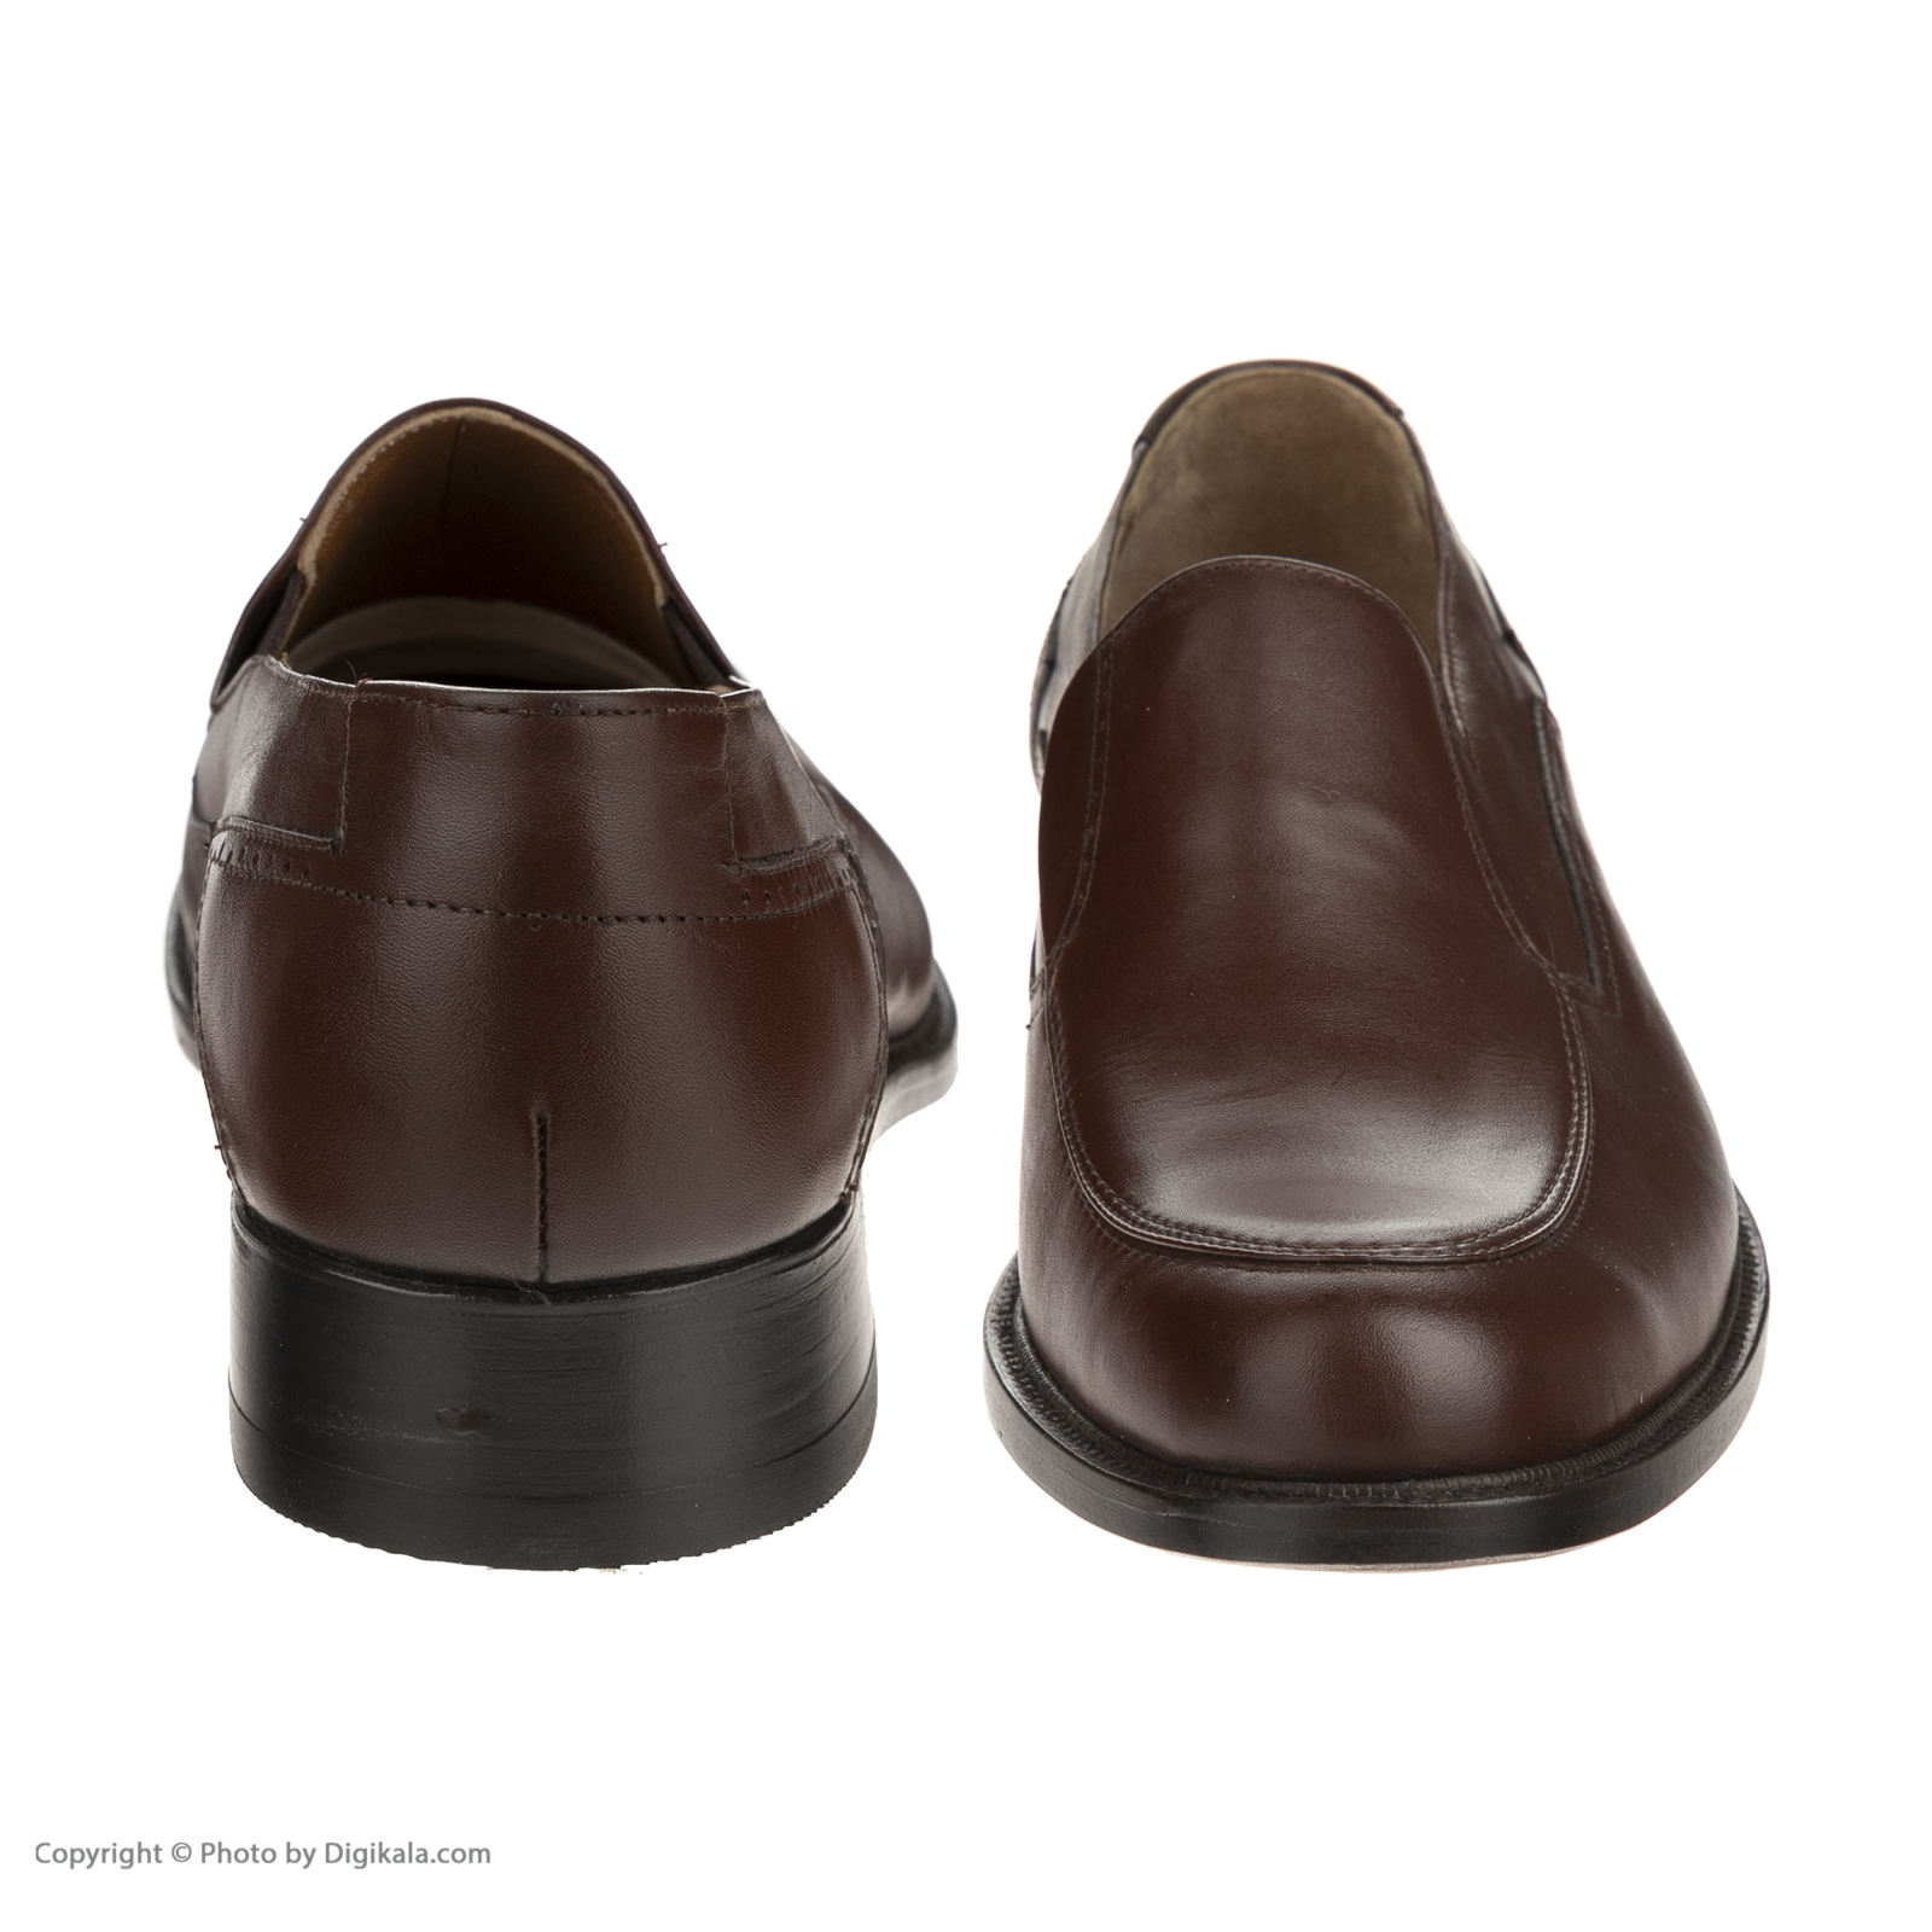 کفش مردانه نظری کد 434 -  - 5